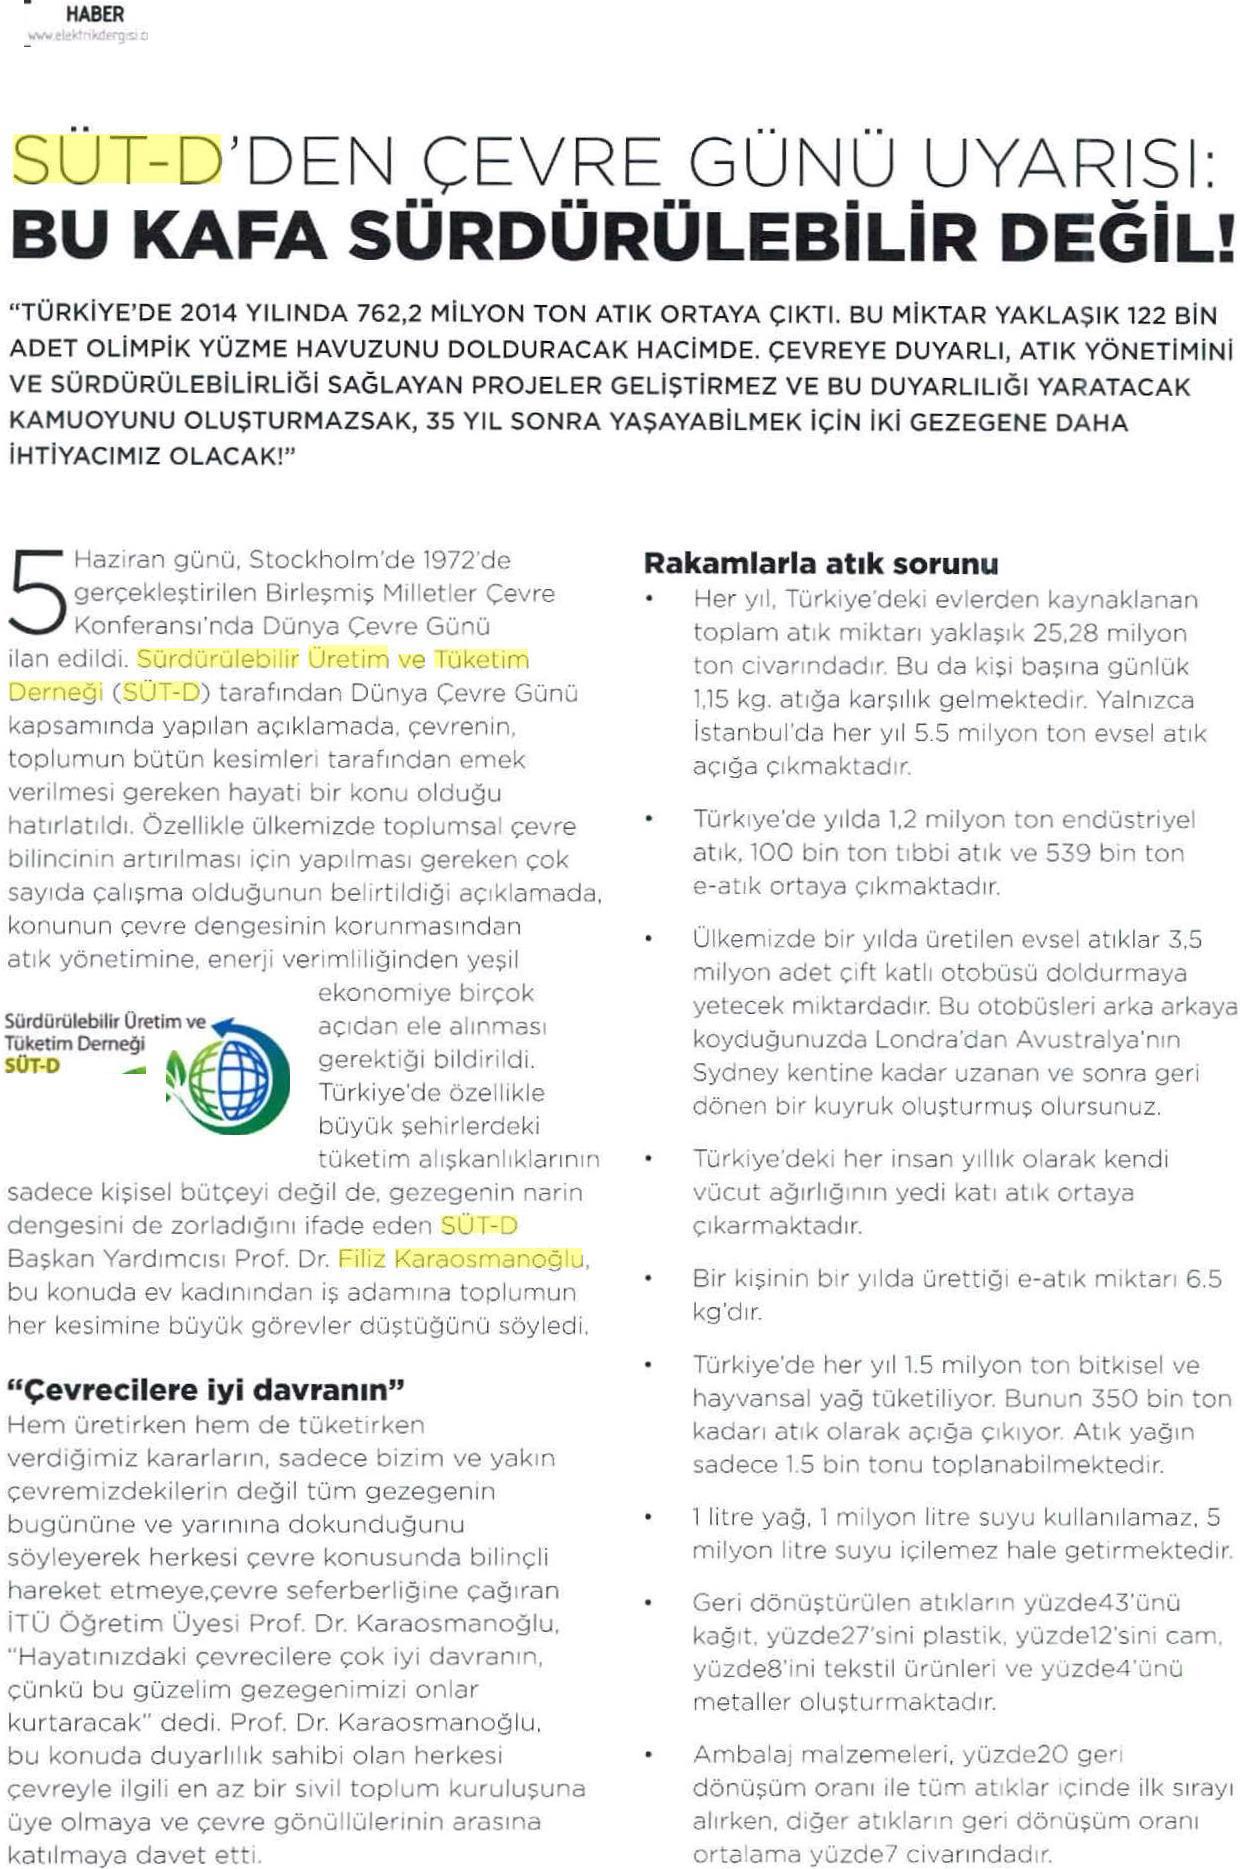 Kaynak Elektrik Dergisi 01.06.2015 2